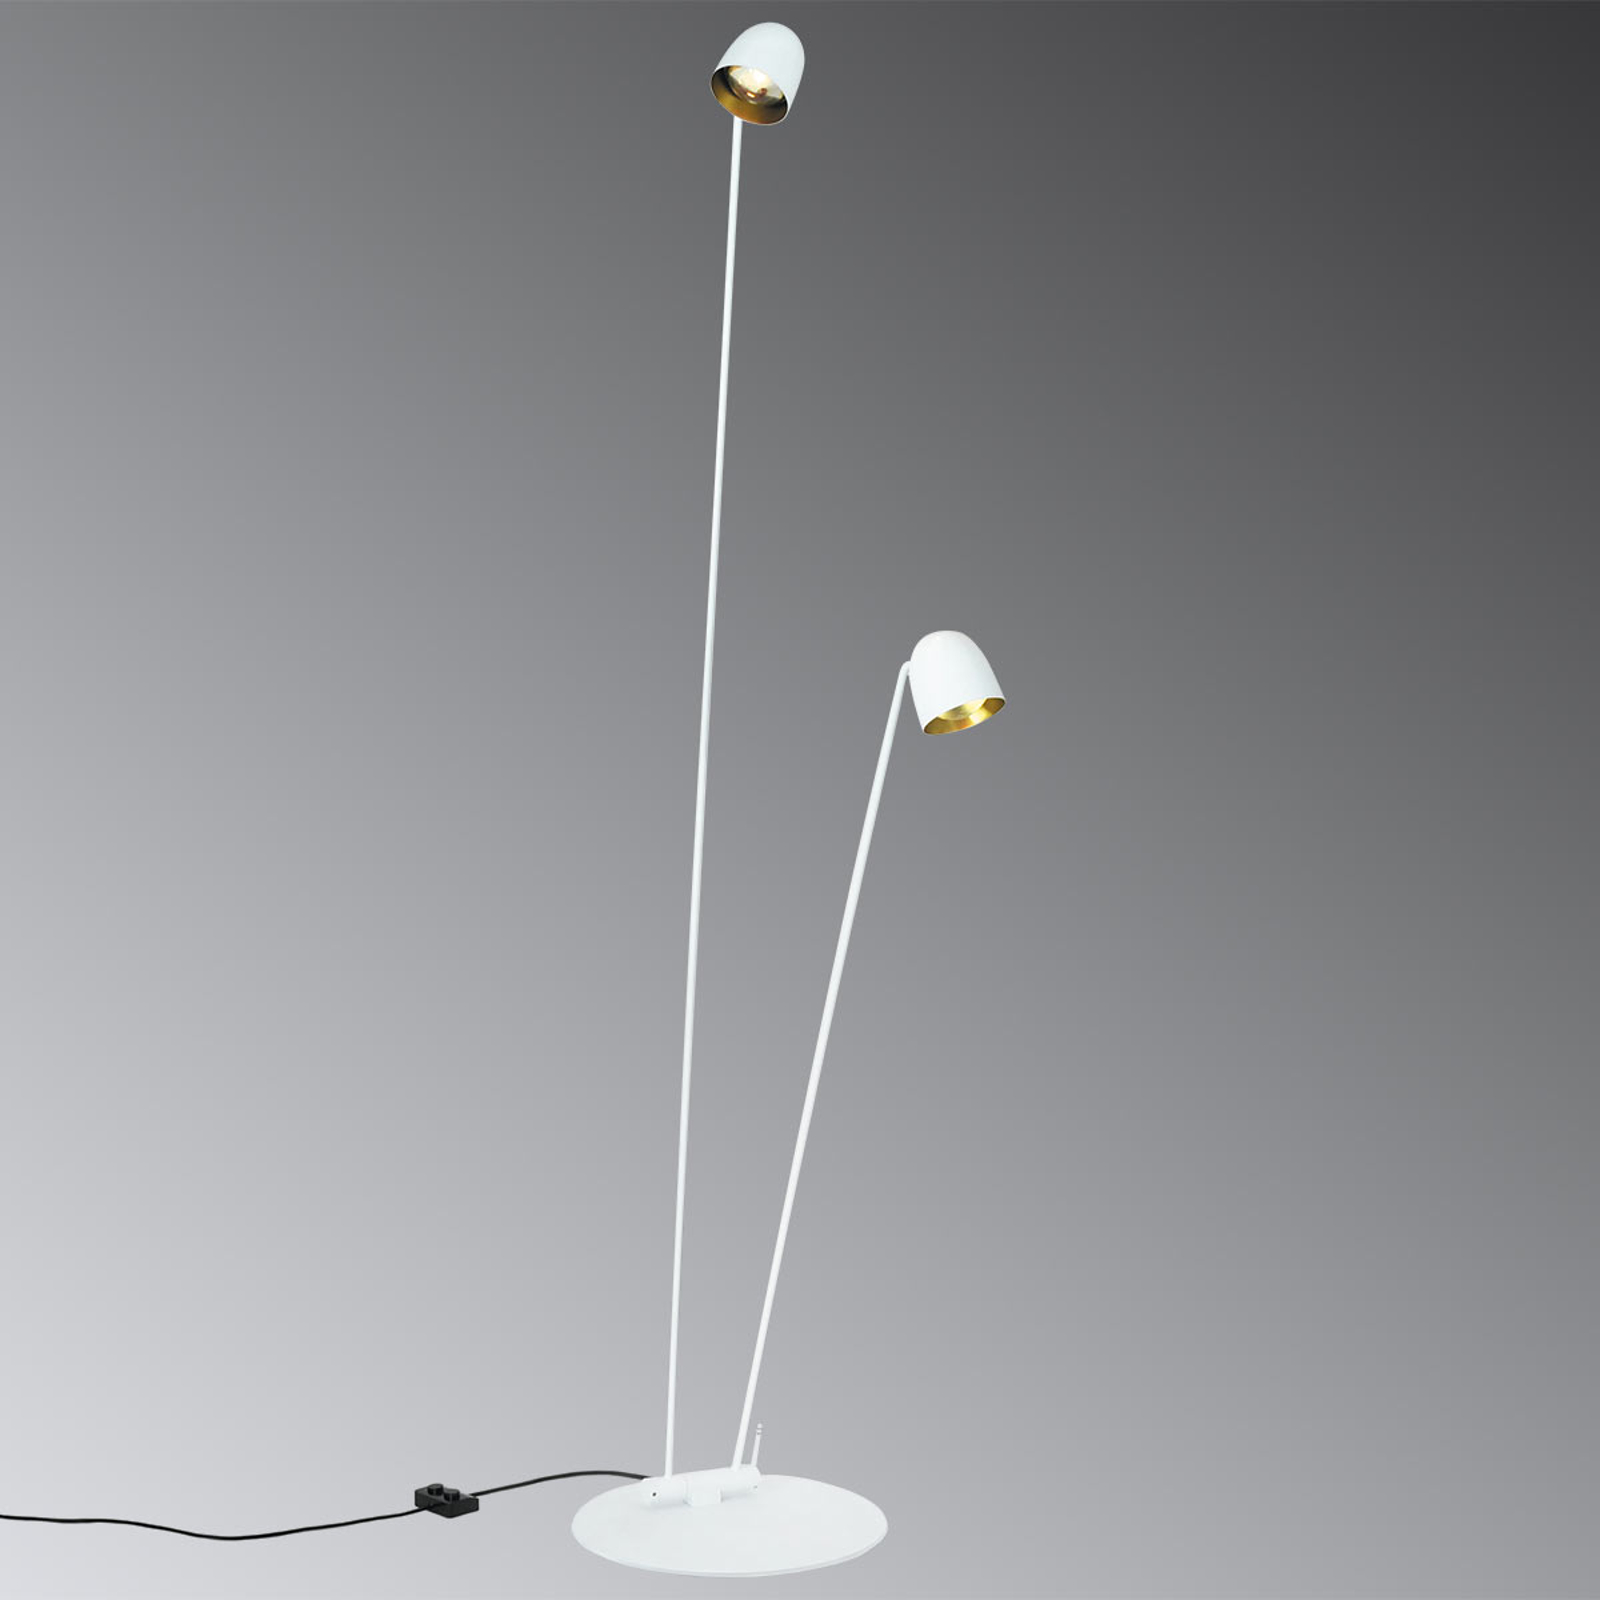 Fleksibel justerbar LED standerlampe Speers F hvid